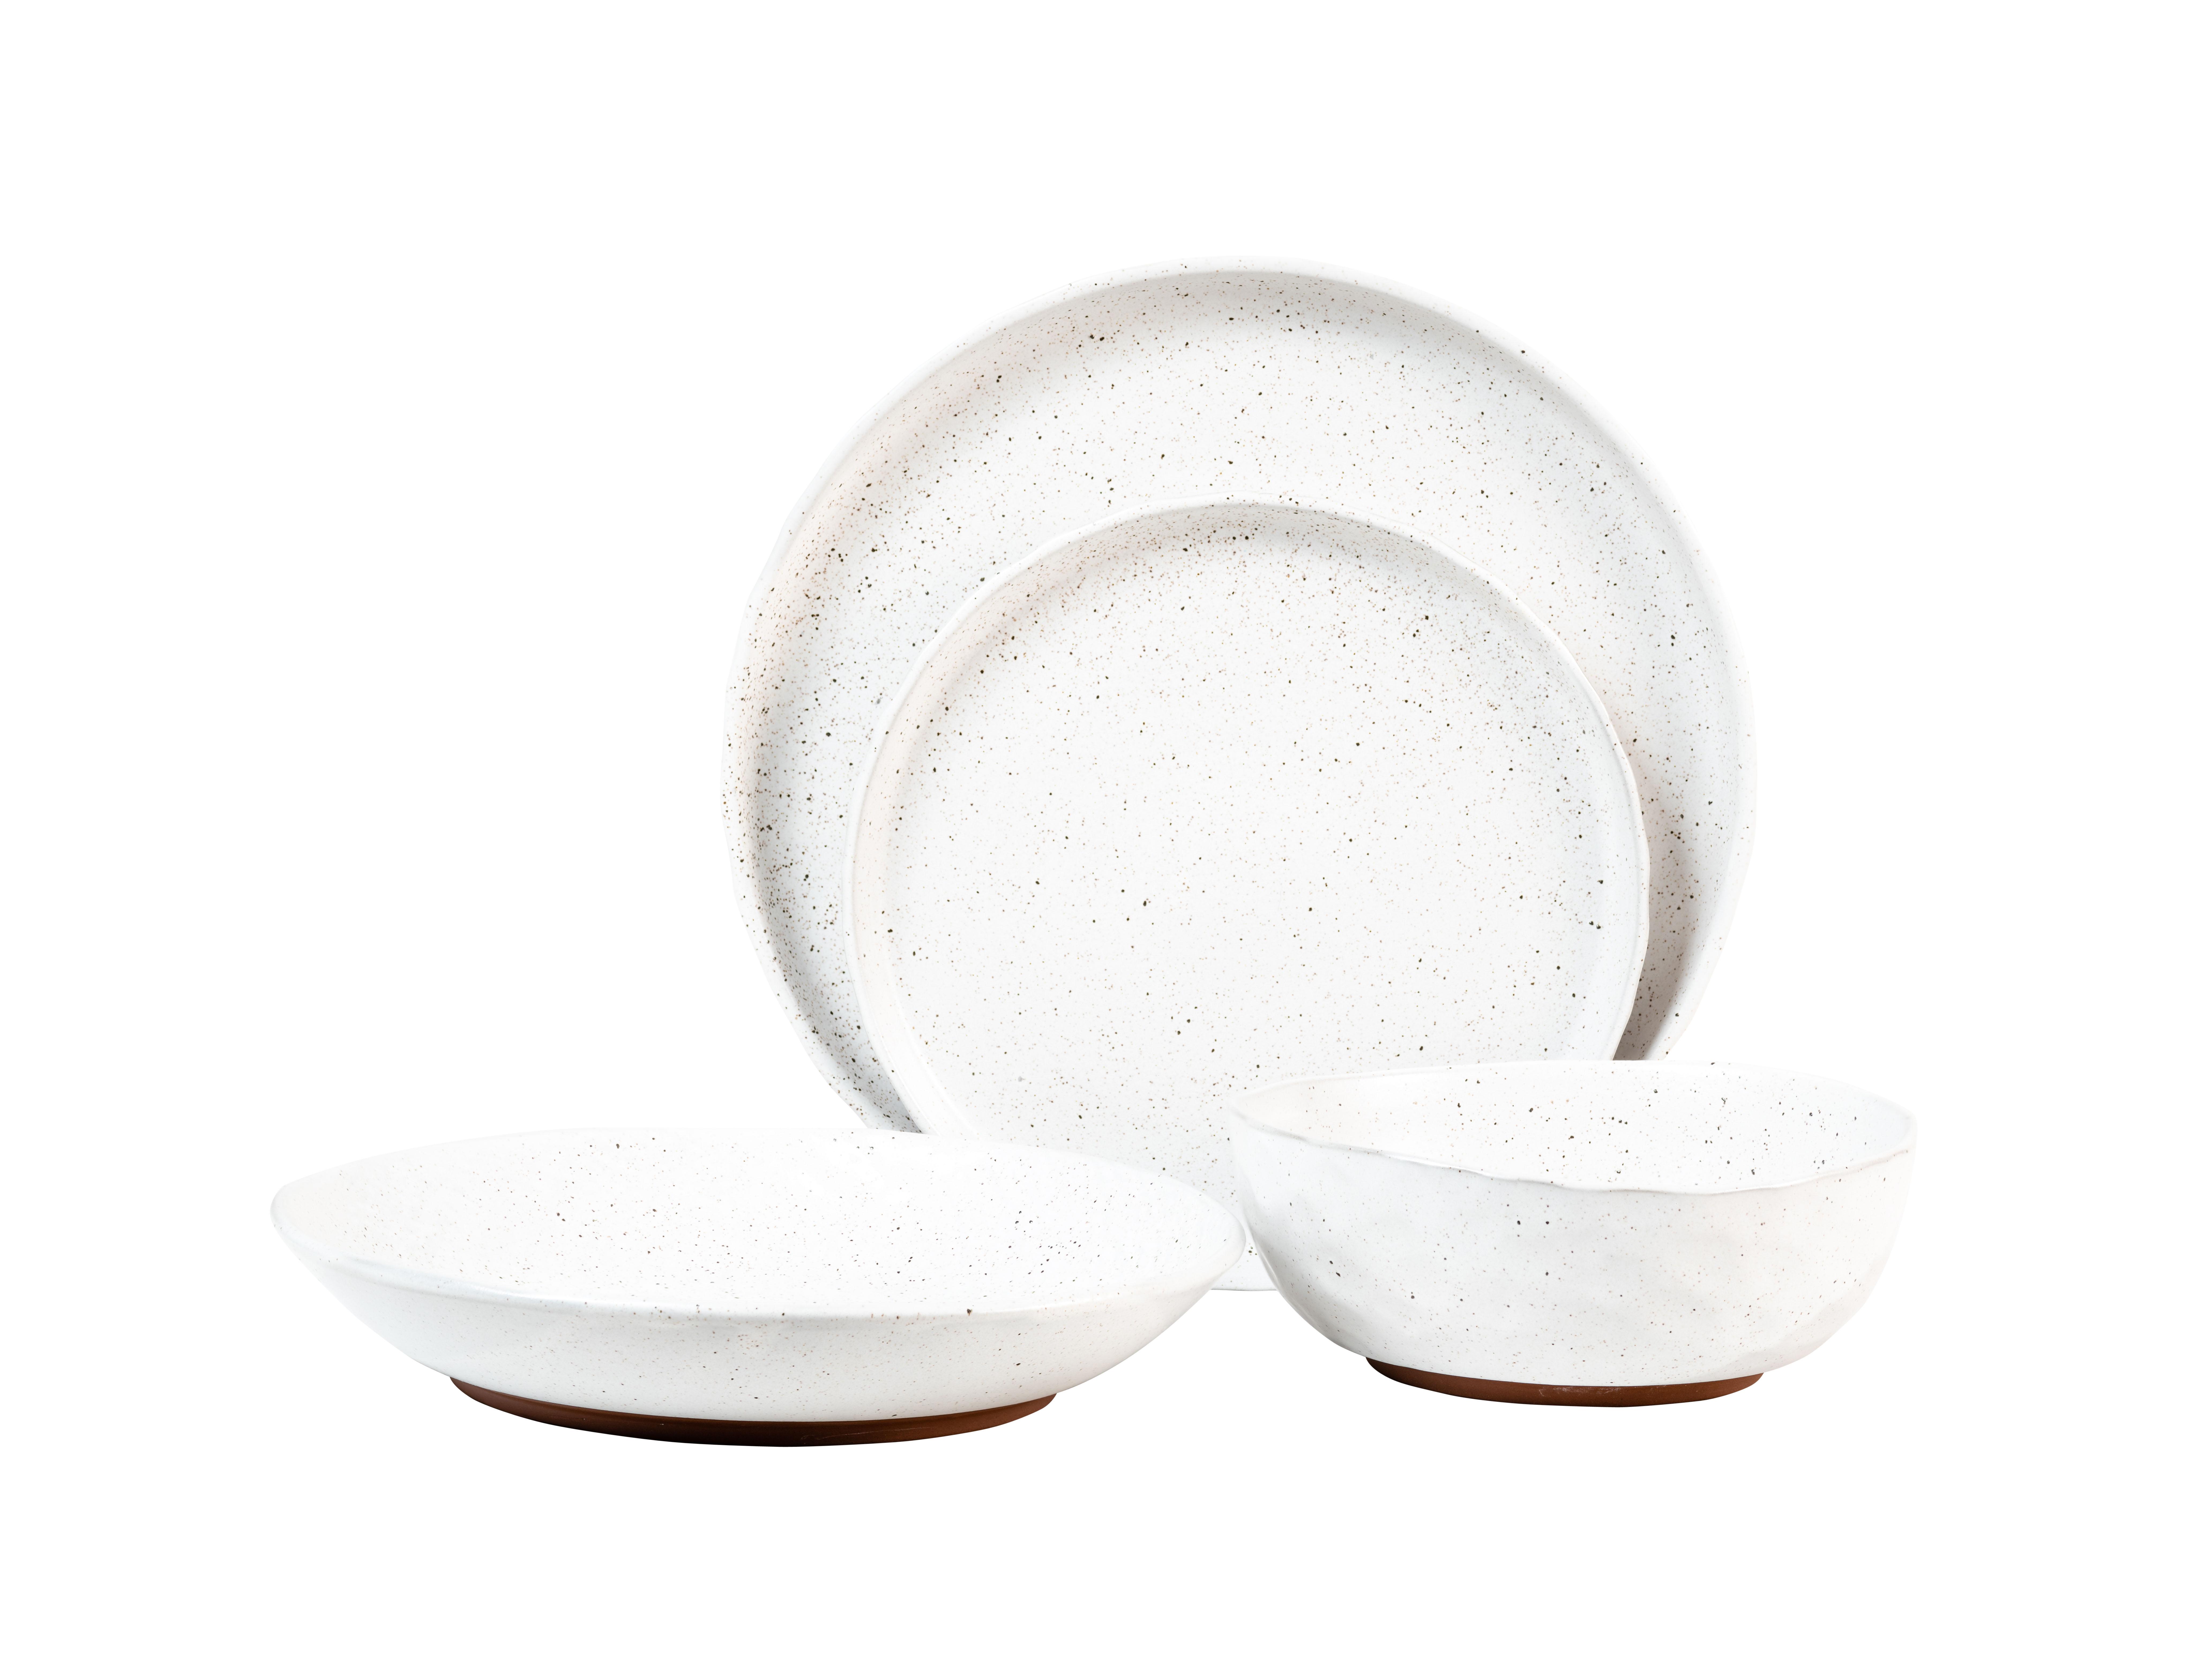 Sango Kaya White 16 Piece Dinnerware Set With Regard To Latest Kaya 3 Piece Dining Sets (View 19 of 20)